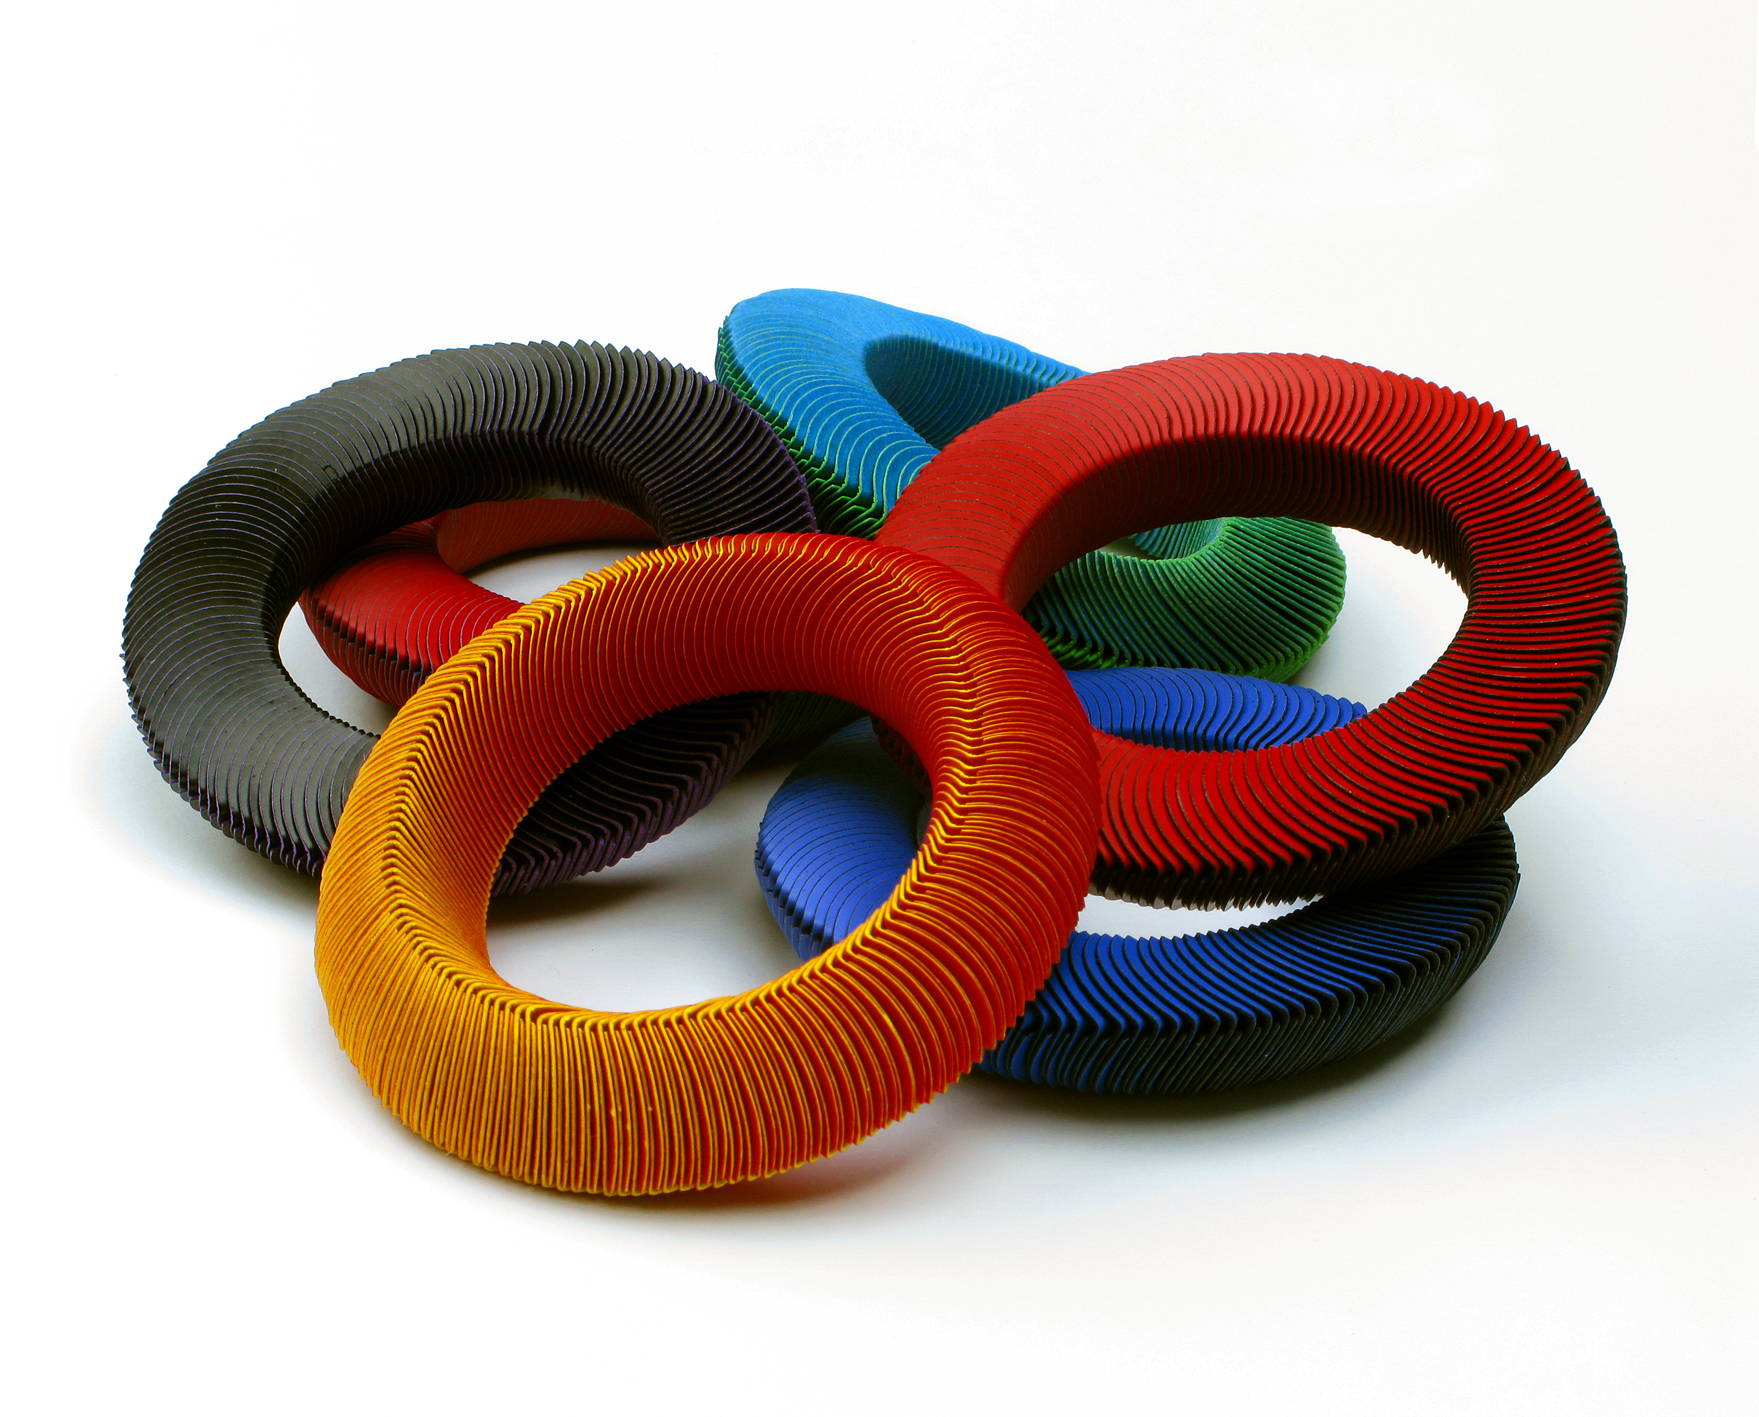 Nel Linssen, Armbanden, papier, plastic, 2010